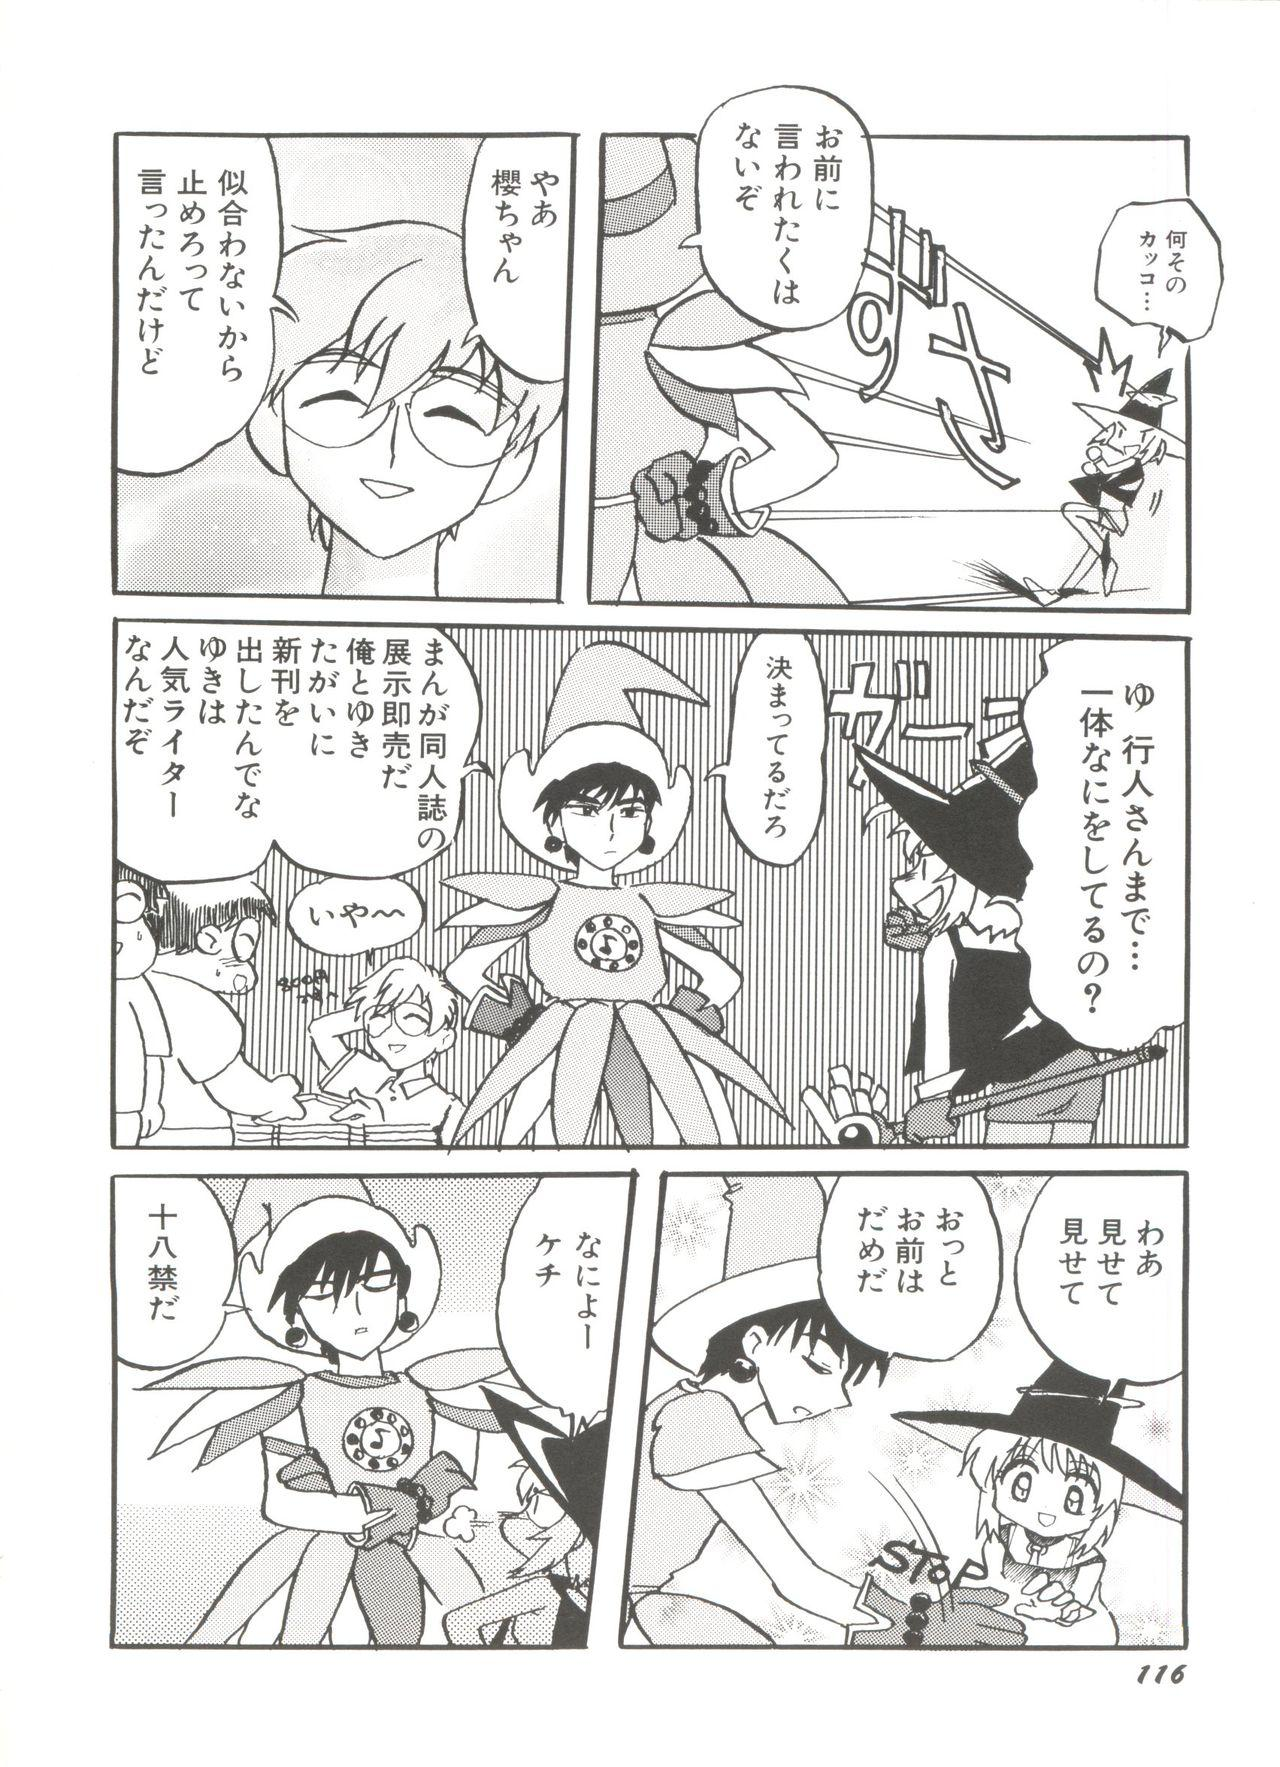 [Anthology] Denei Tamatebako 8 - Utakata no Tenshi-tachi II (Various) 117